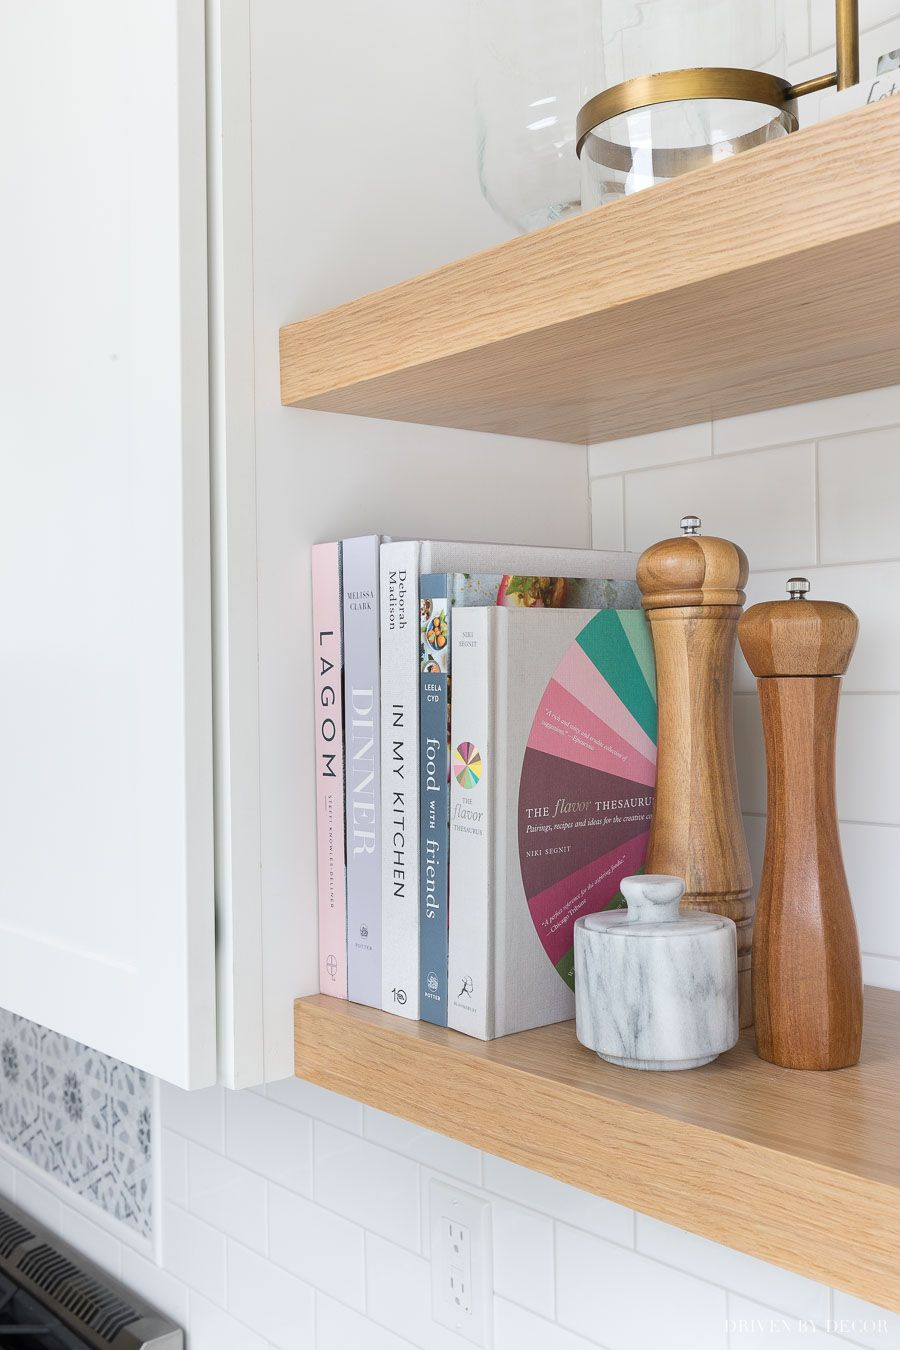 Diy Floating Corner Shelves In Our Kitchen All The Details